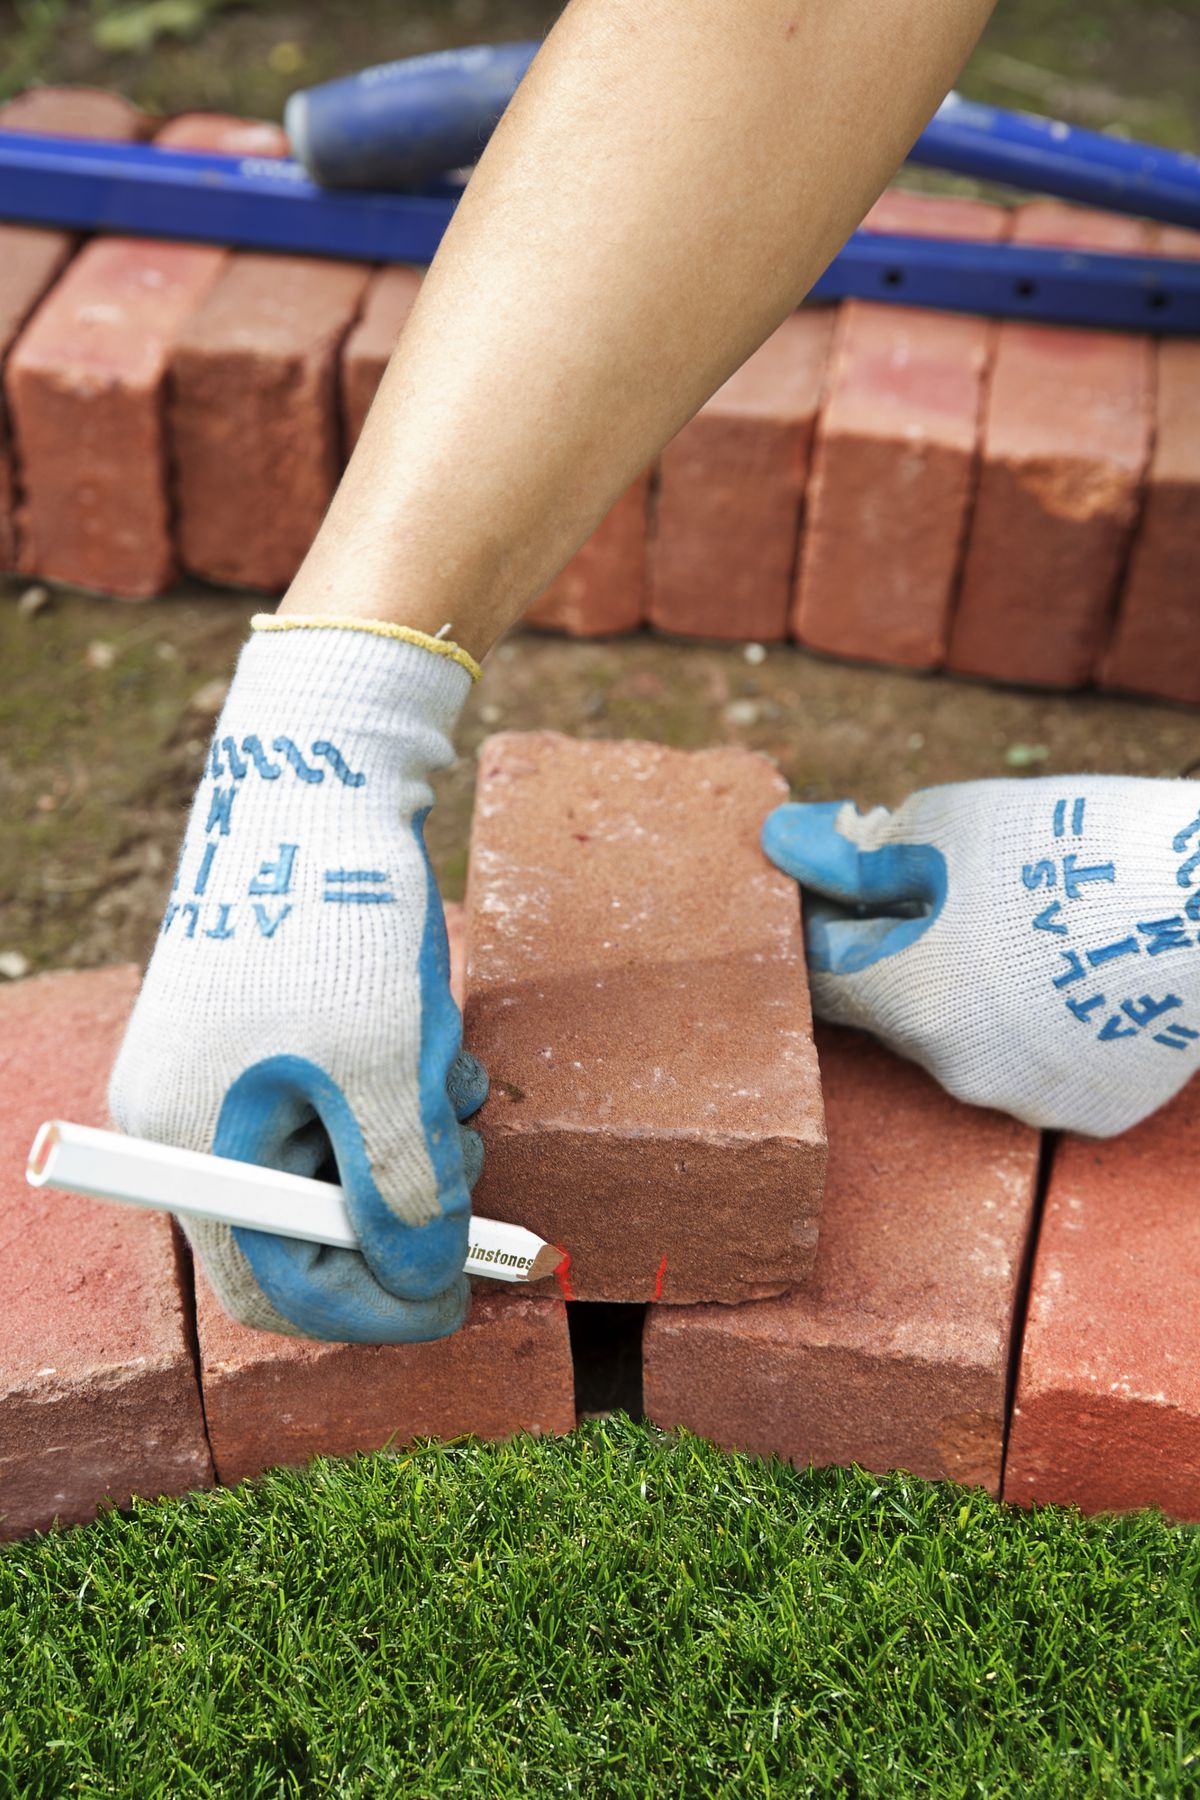 Man Marks Bricks To Fill Gaps In Curves For Brick Garden Edging